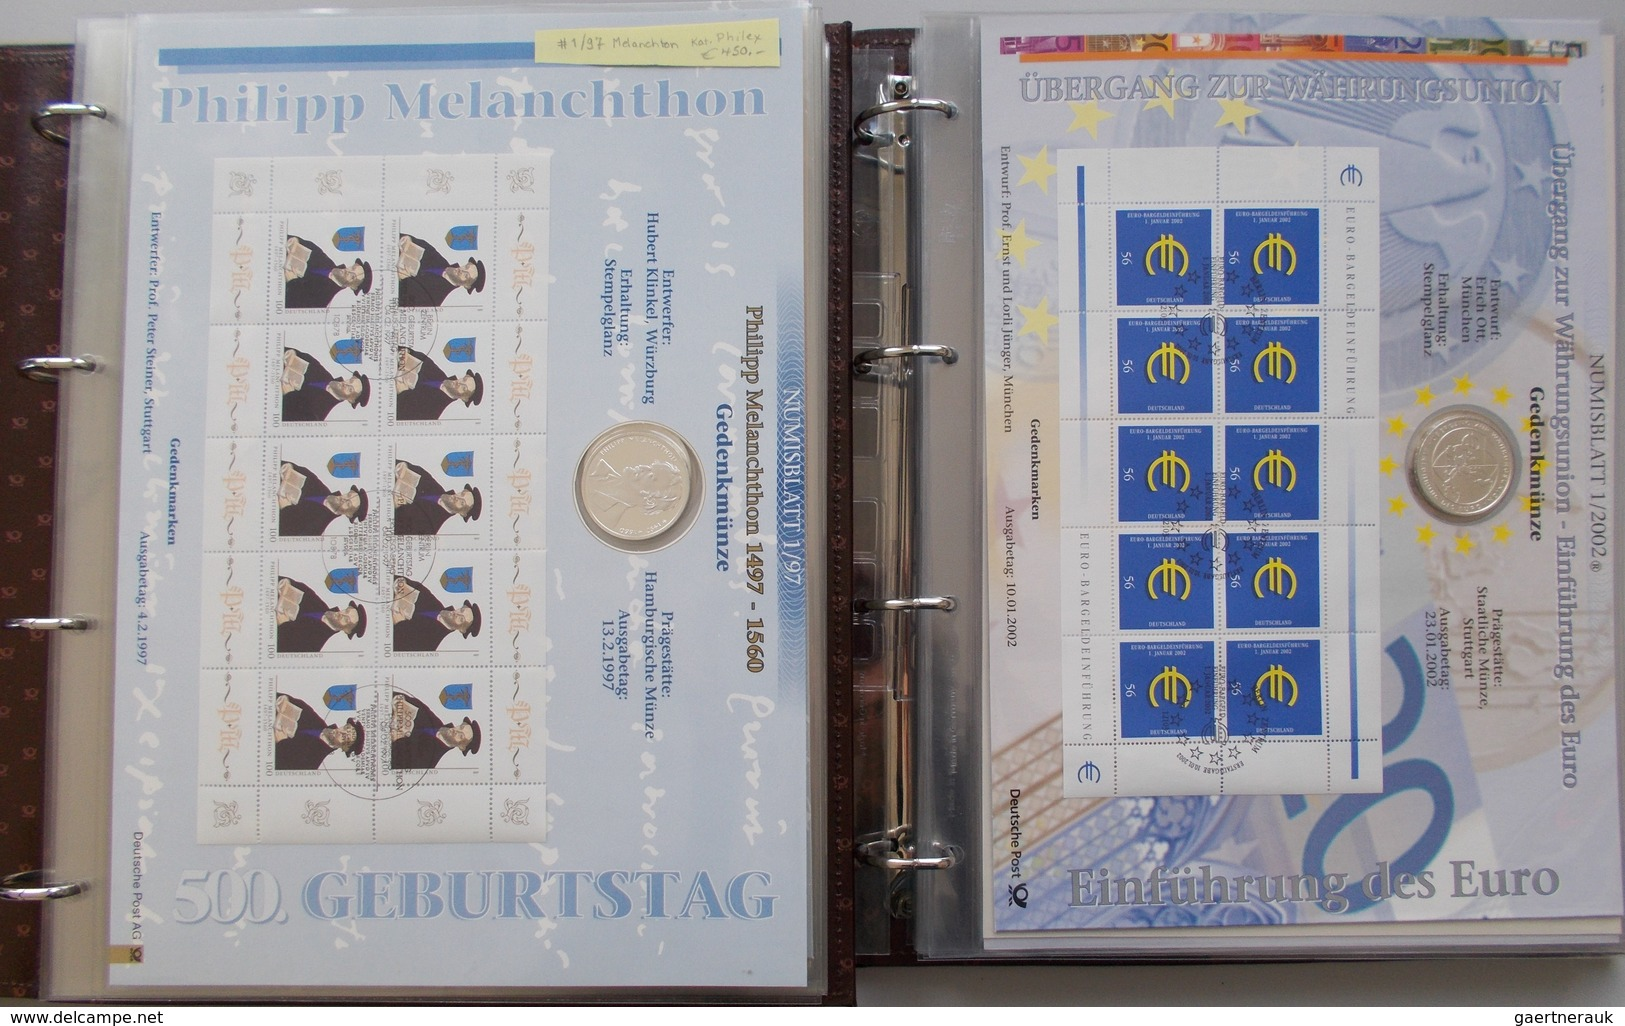 Numisbriefe, Numisblätter: Komplette Sammlung In 2 Bänder: 28 Numisblätter Ab Nr. 1/1997 Philipp Mel - Coins